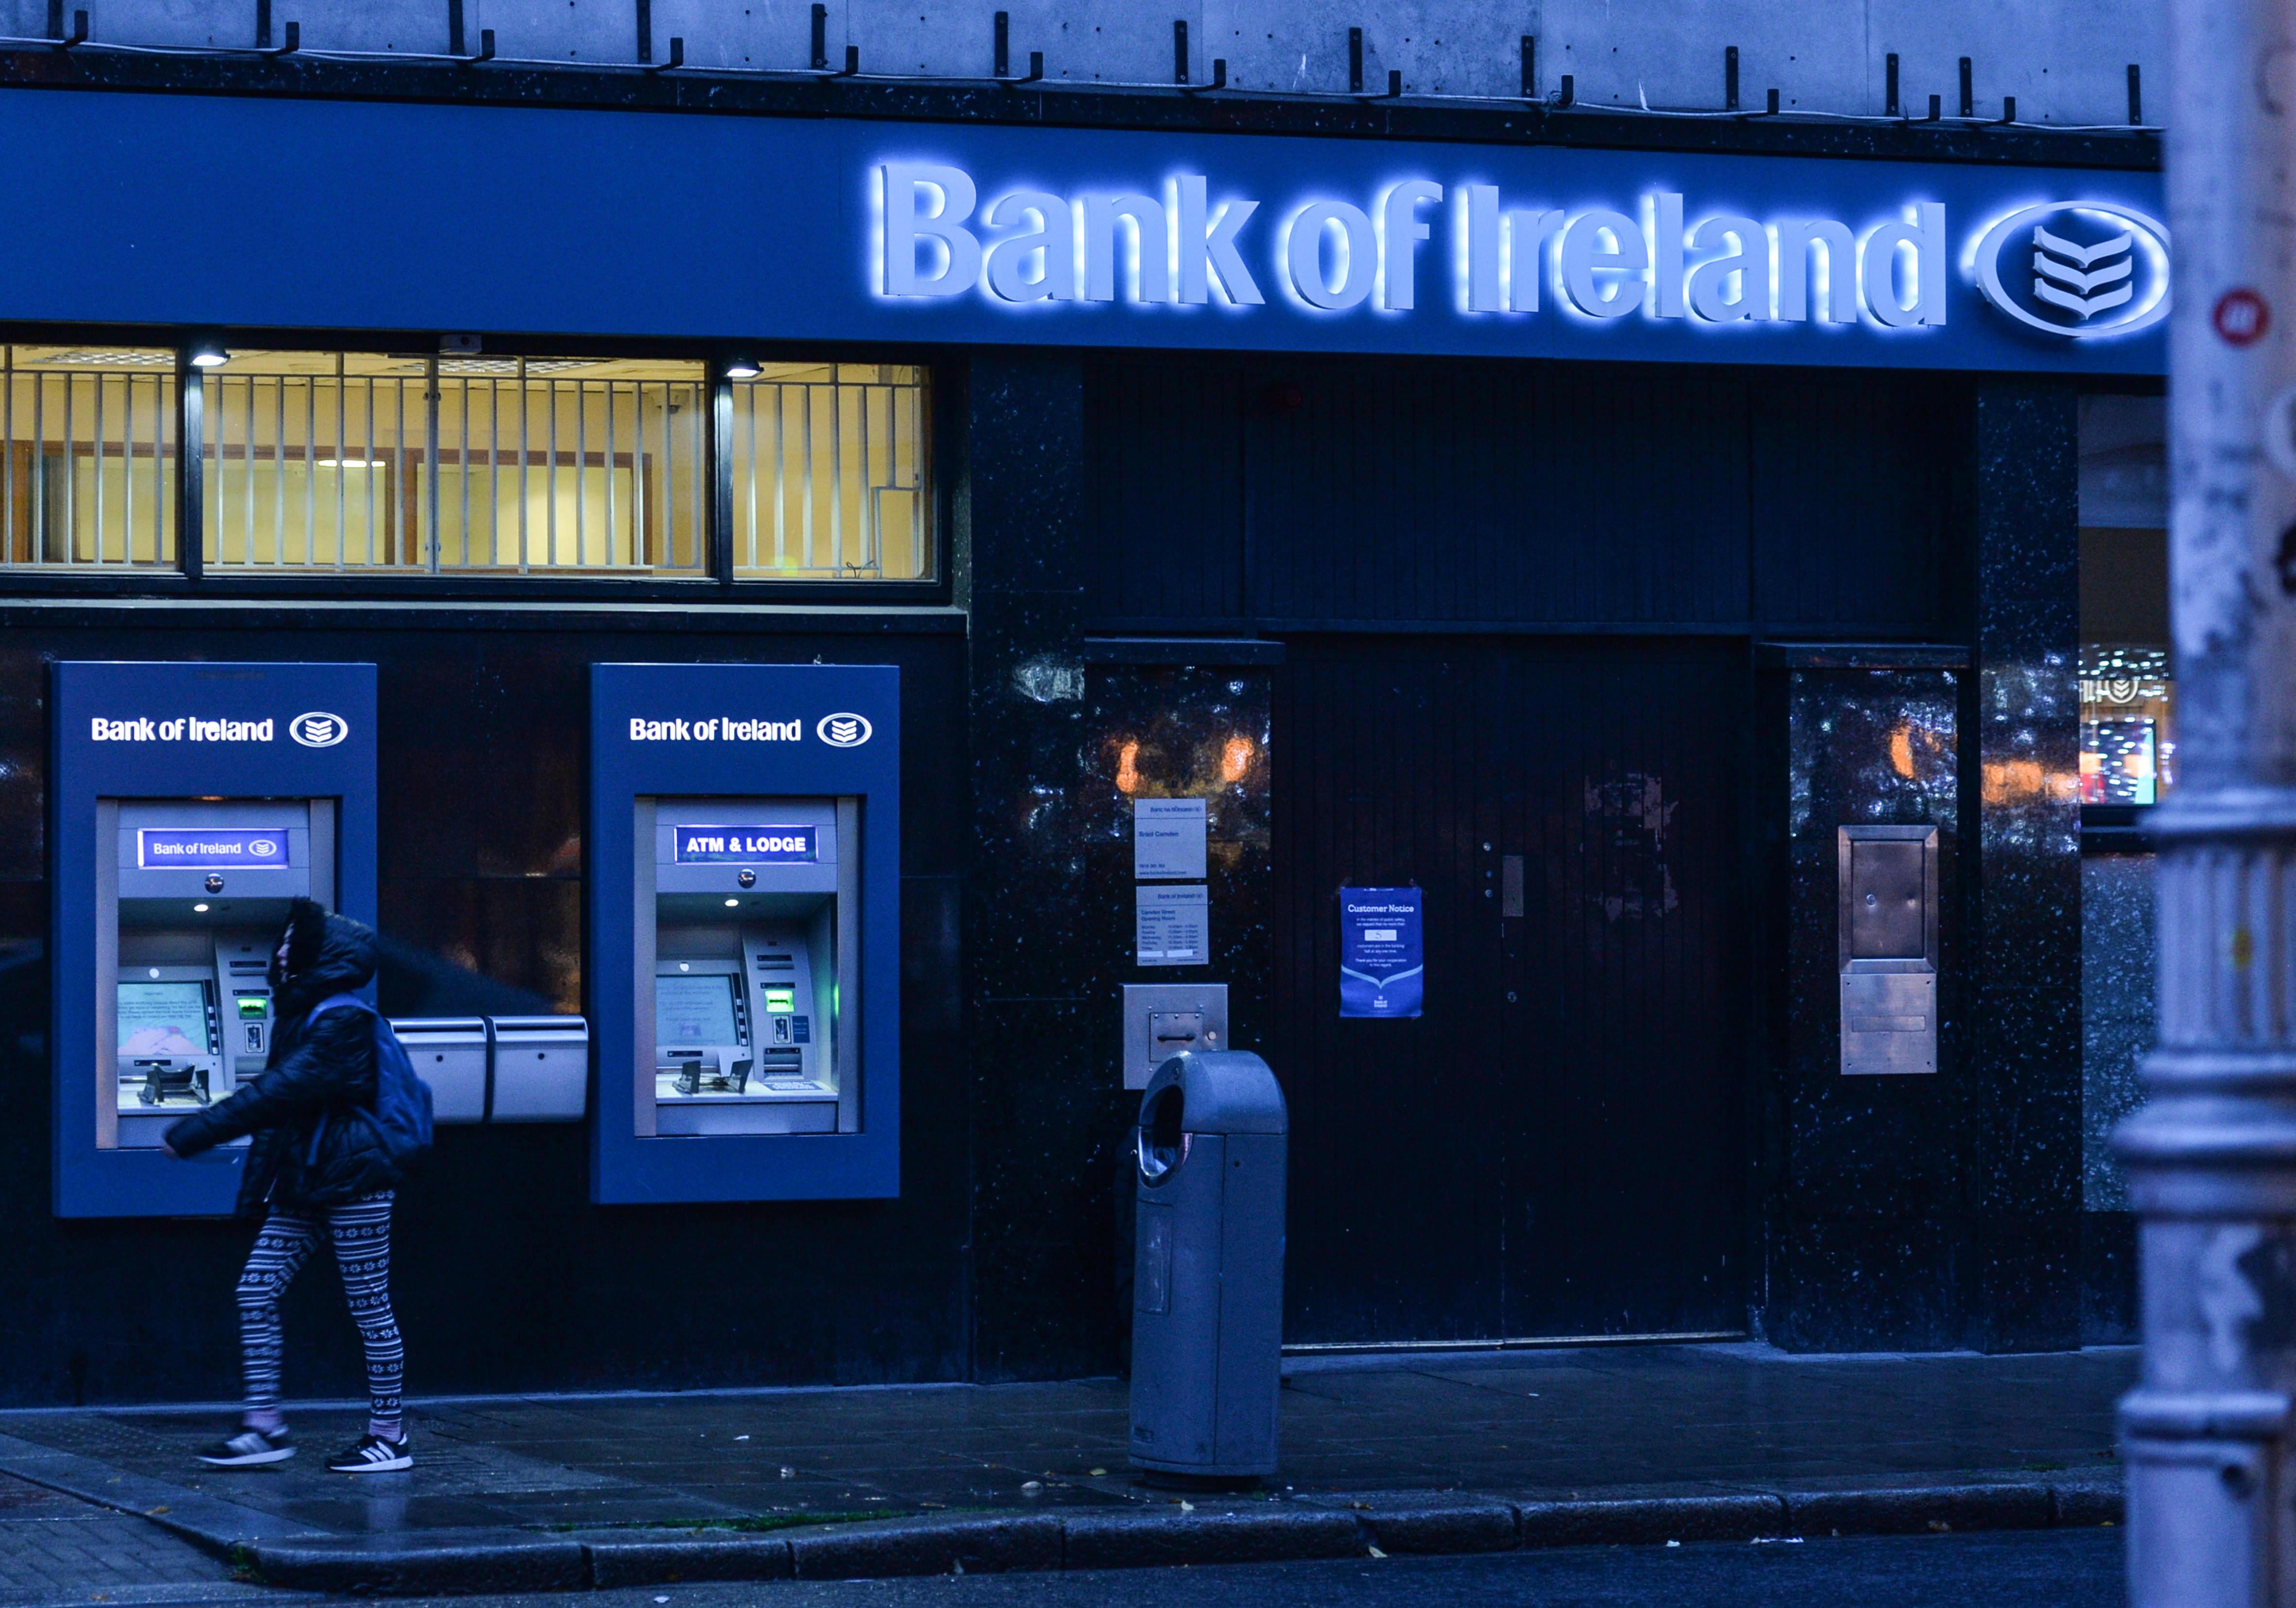 The Irish banking landscape is undergoing radical changes